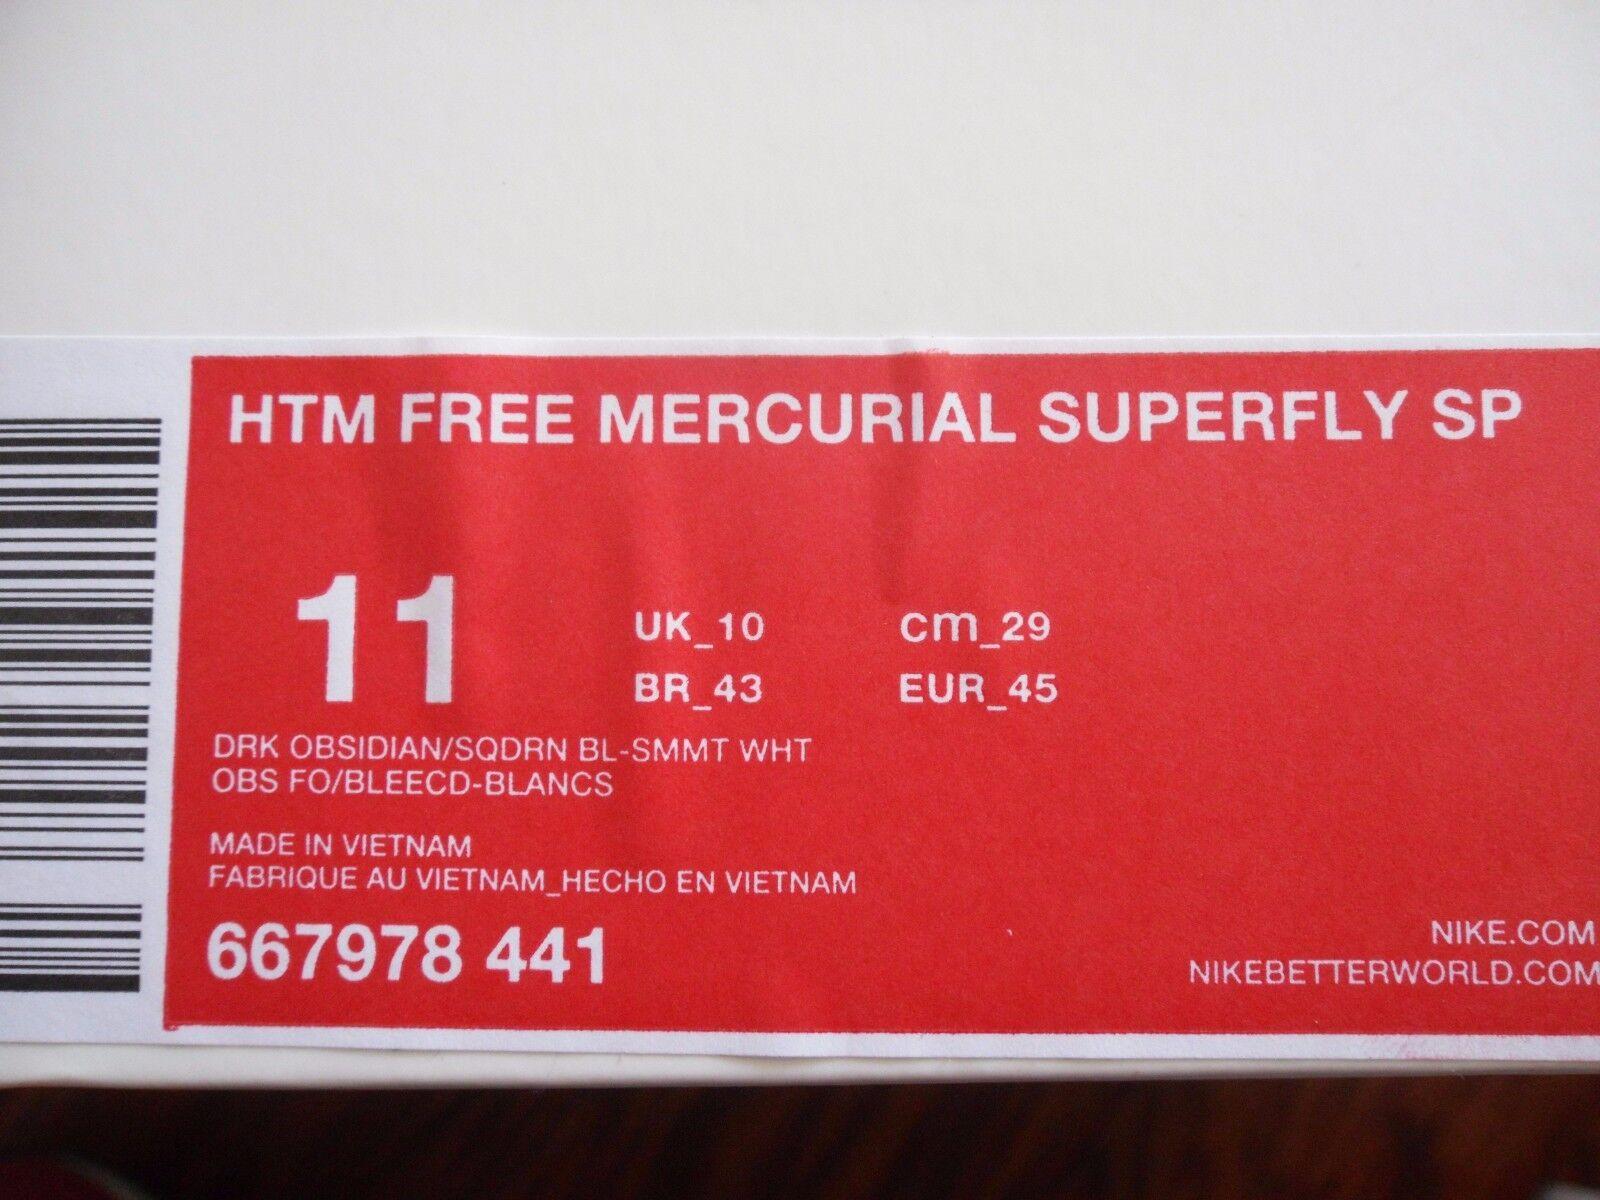 NIKE FREE MERCURIAL SUPERFLY SP DARK OBSIDIAN NAVY BLUE SZ SZ SZ 11 [667978-441] caf27f